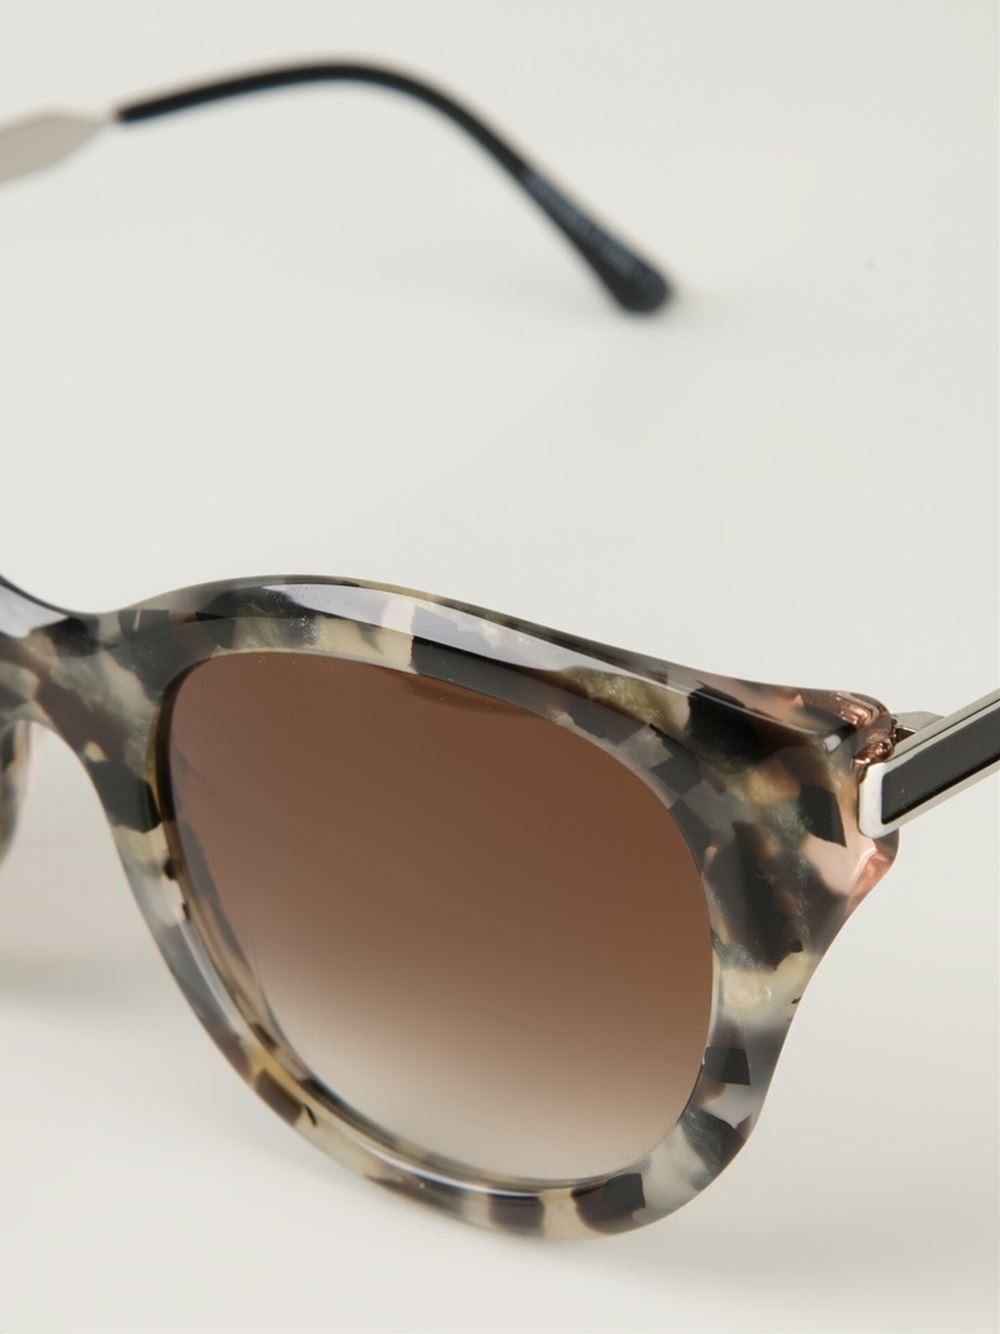 https://cdna.lystit.com/photos/59a4-2015/03/24/thierry-lasry-grey-tortoise-shell-sunglasses-gray-product-0-781284409-normal.jpeg